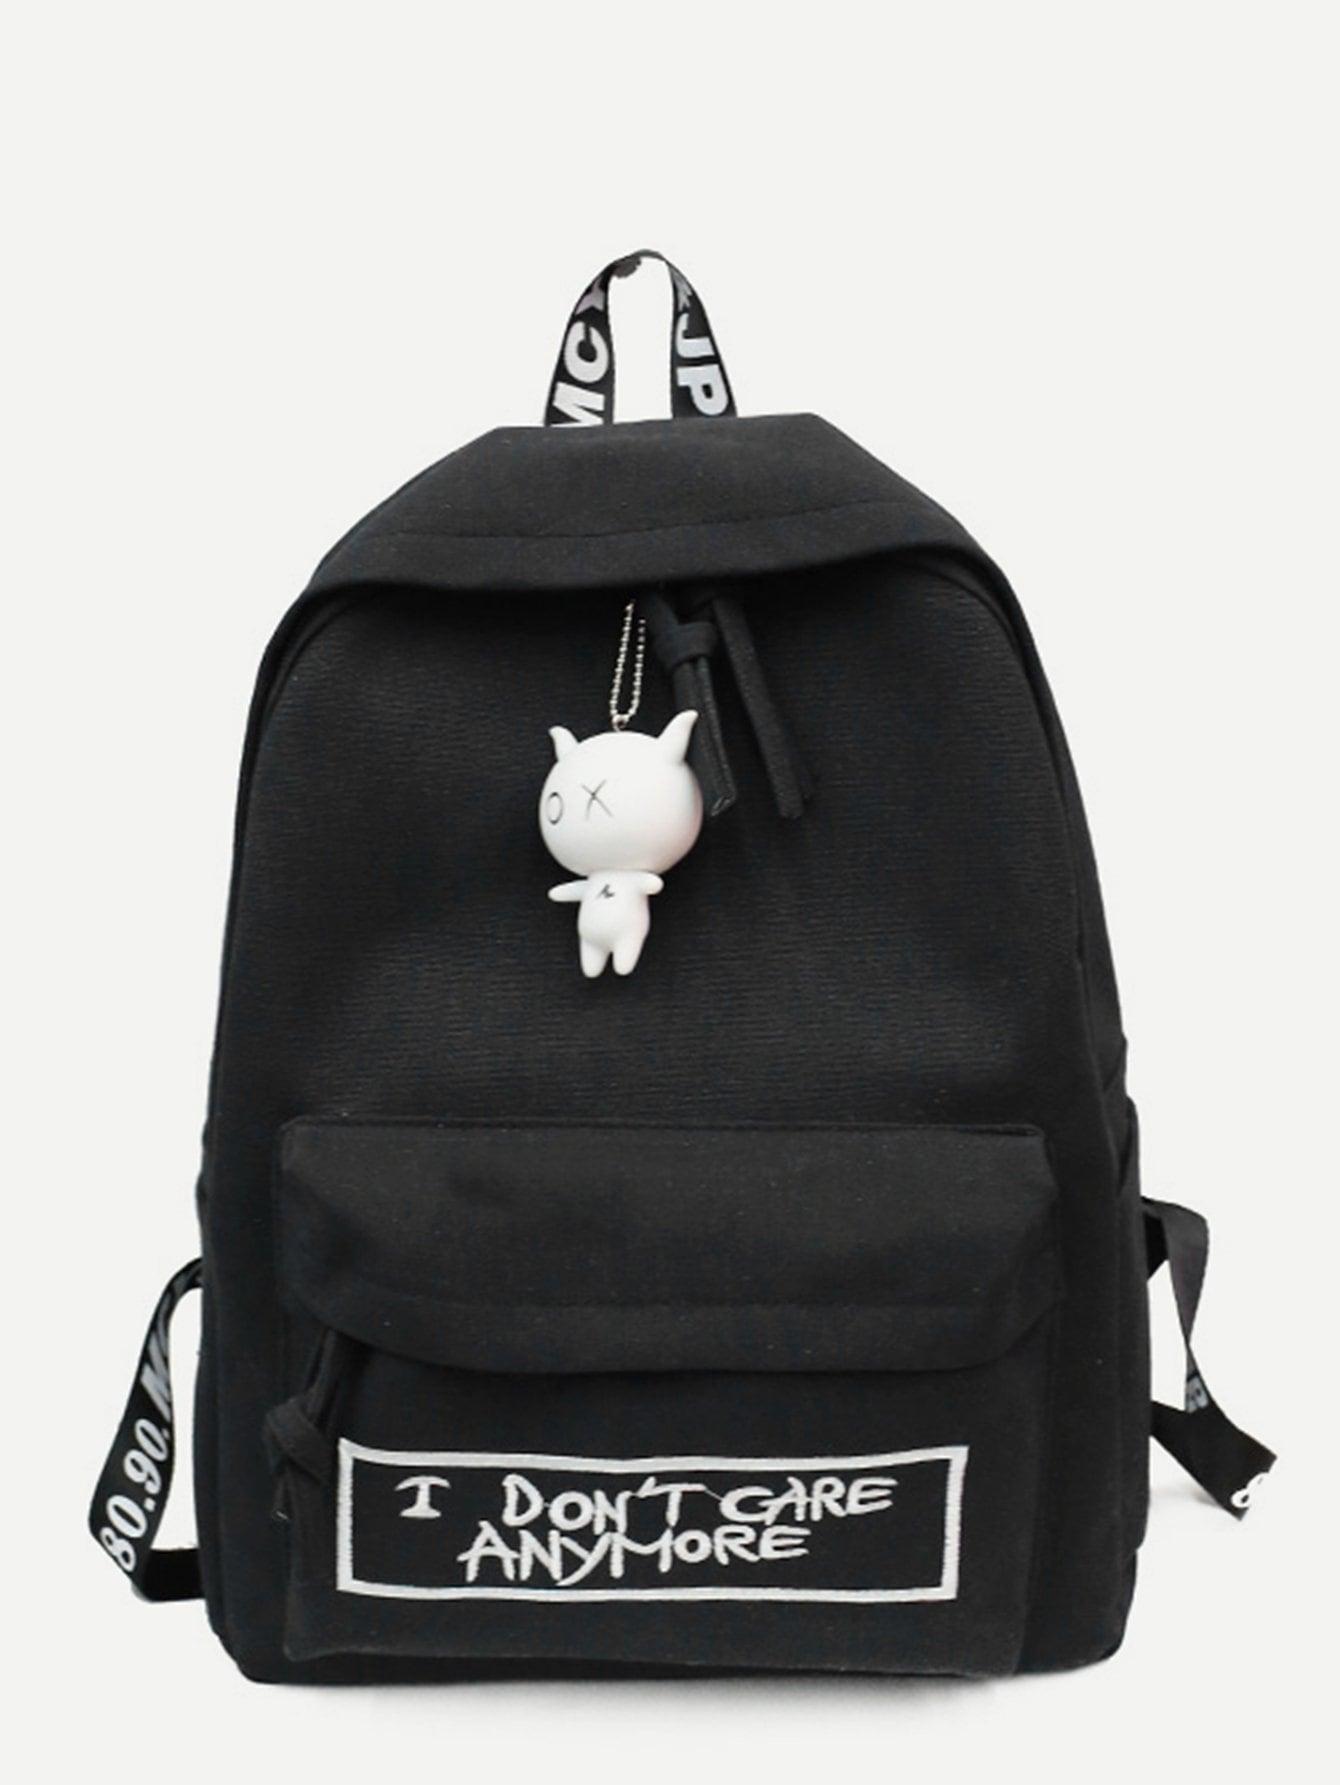 Slogan Embroidered Backpack With Cartoon Charm cartoon charm hair clip 6pcs